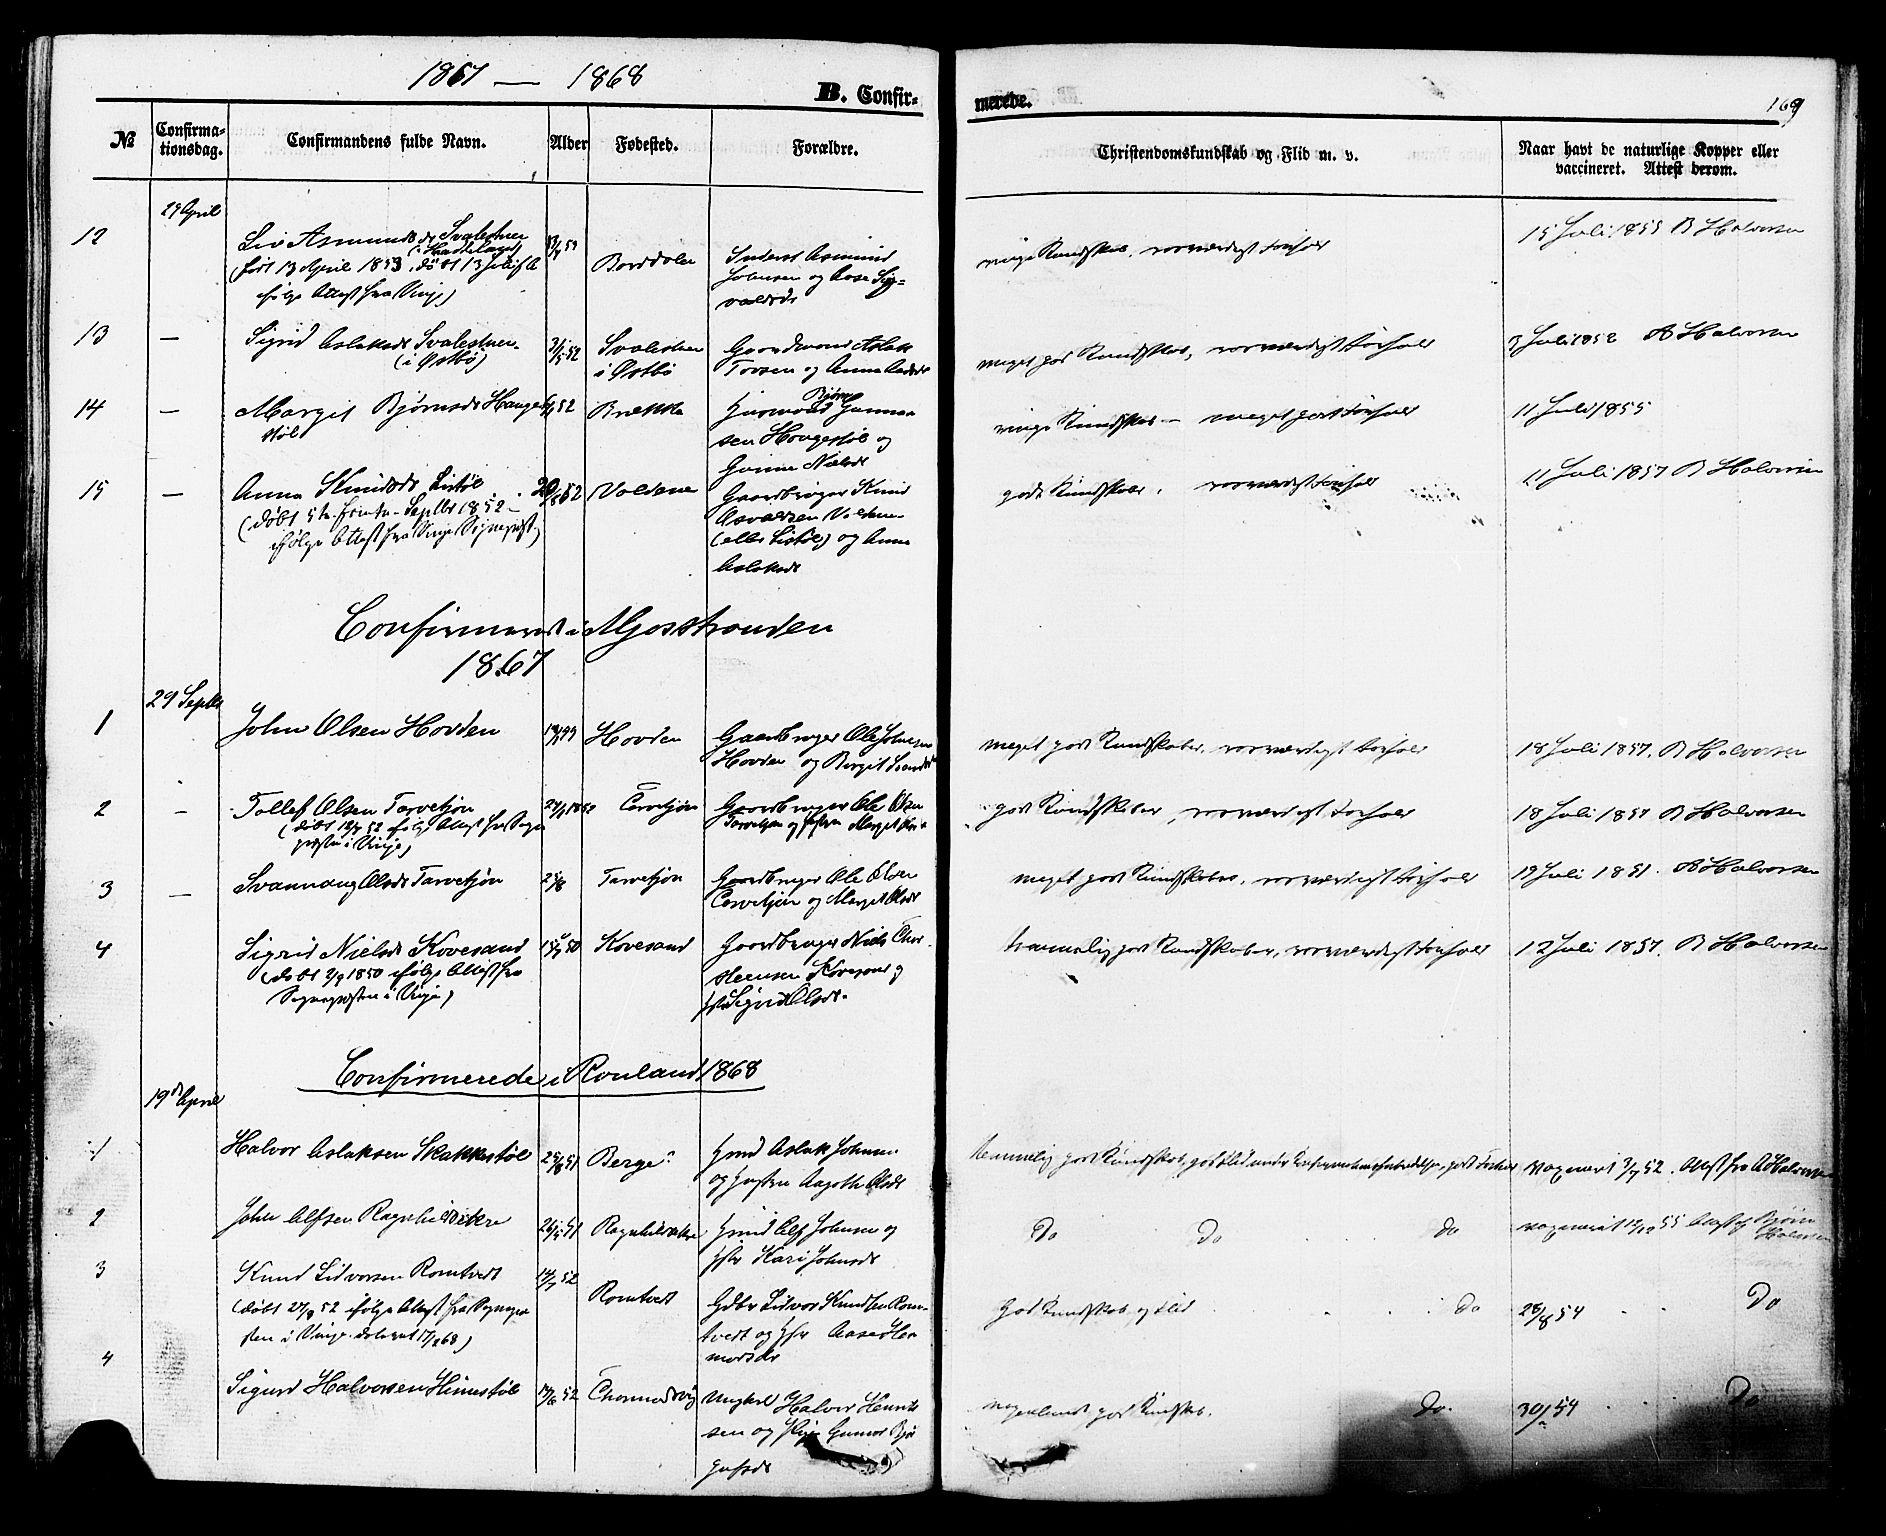 SAKO, Rauland kirkebøker, F/Fa/L0003: Ministerialbok nr. 3, 1859-1886, s. 169